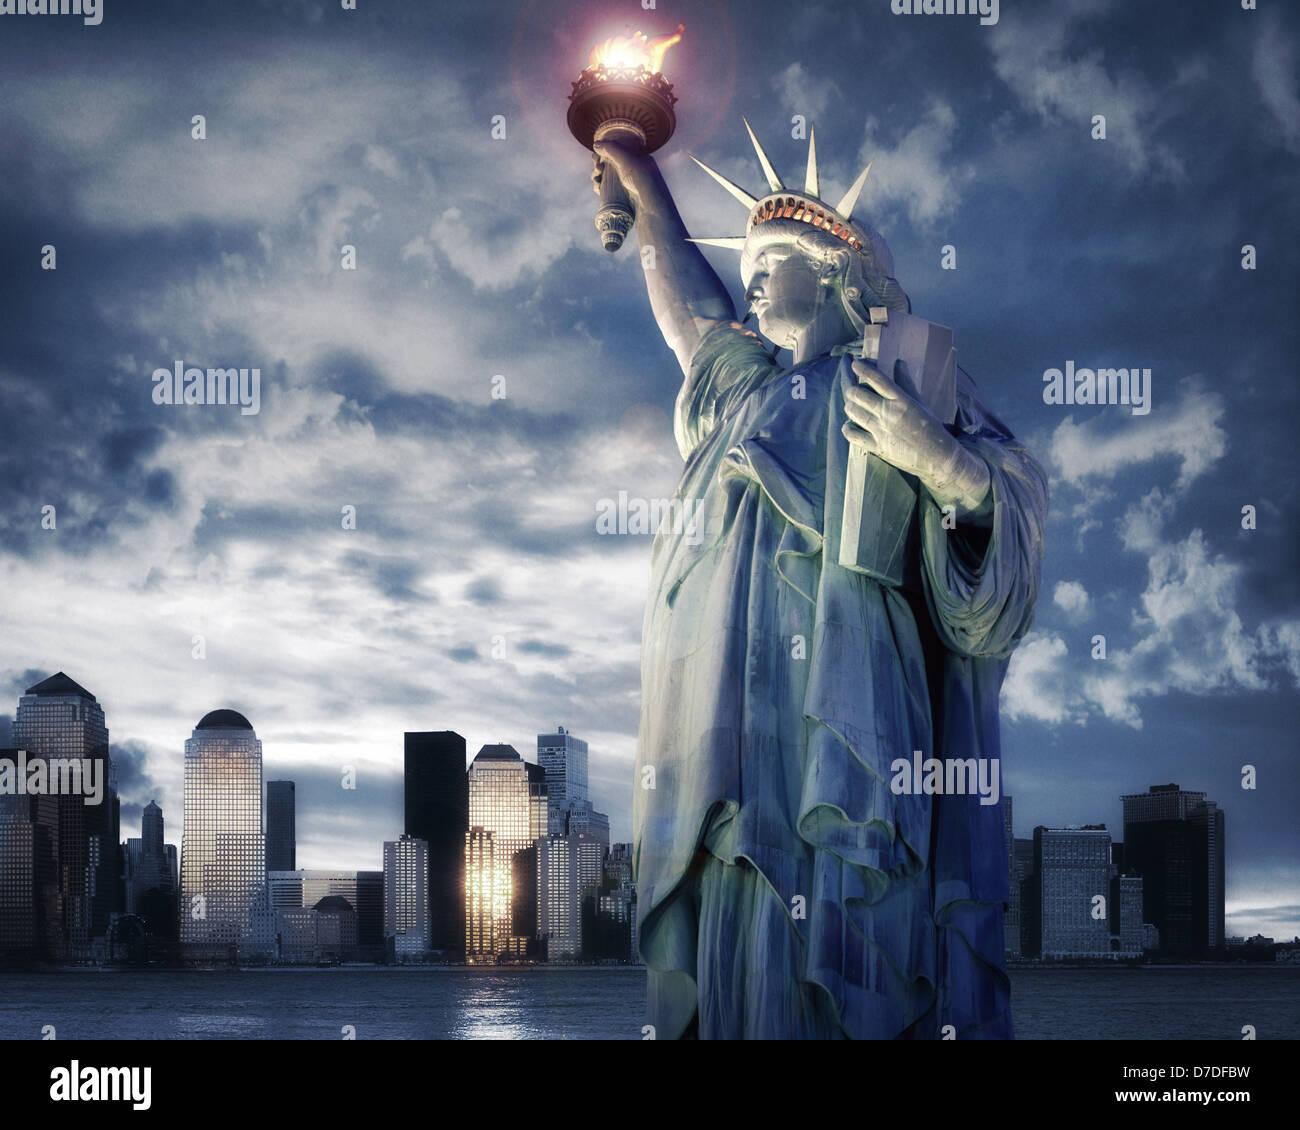 USA - NEW YORK: Reisekonzept Stockfoto